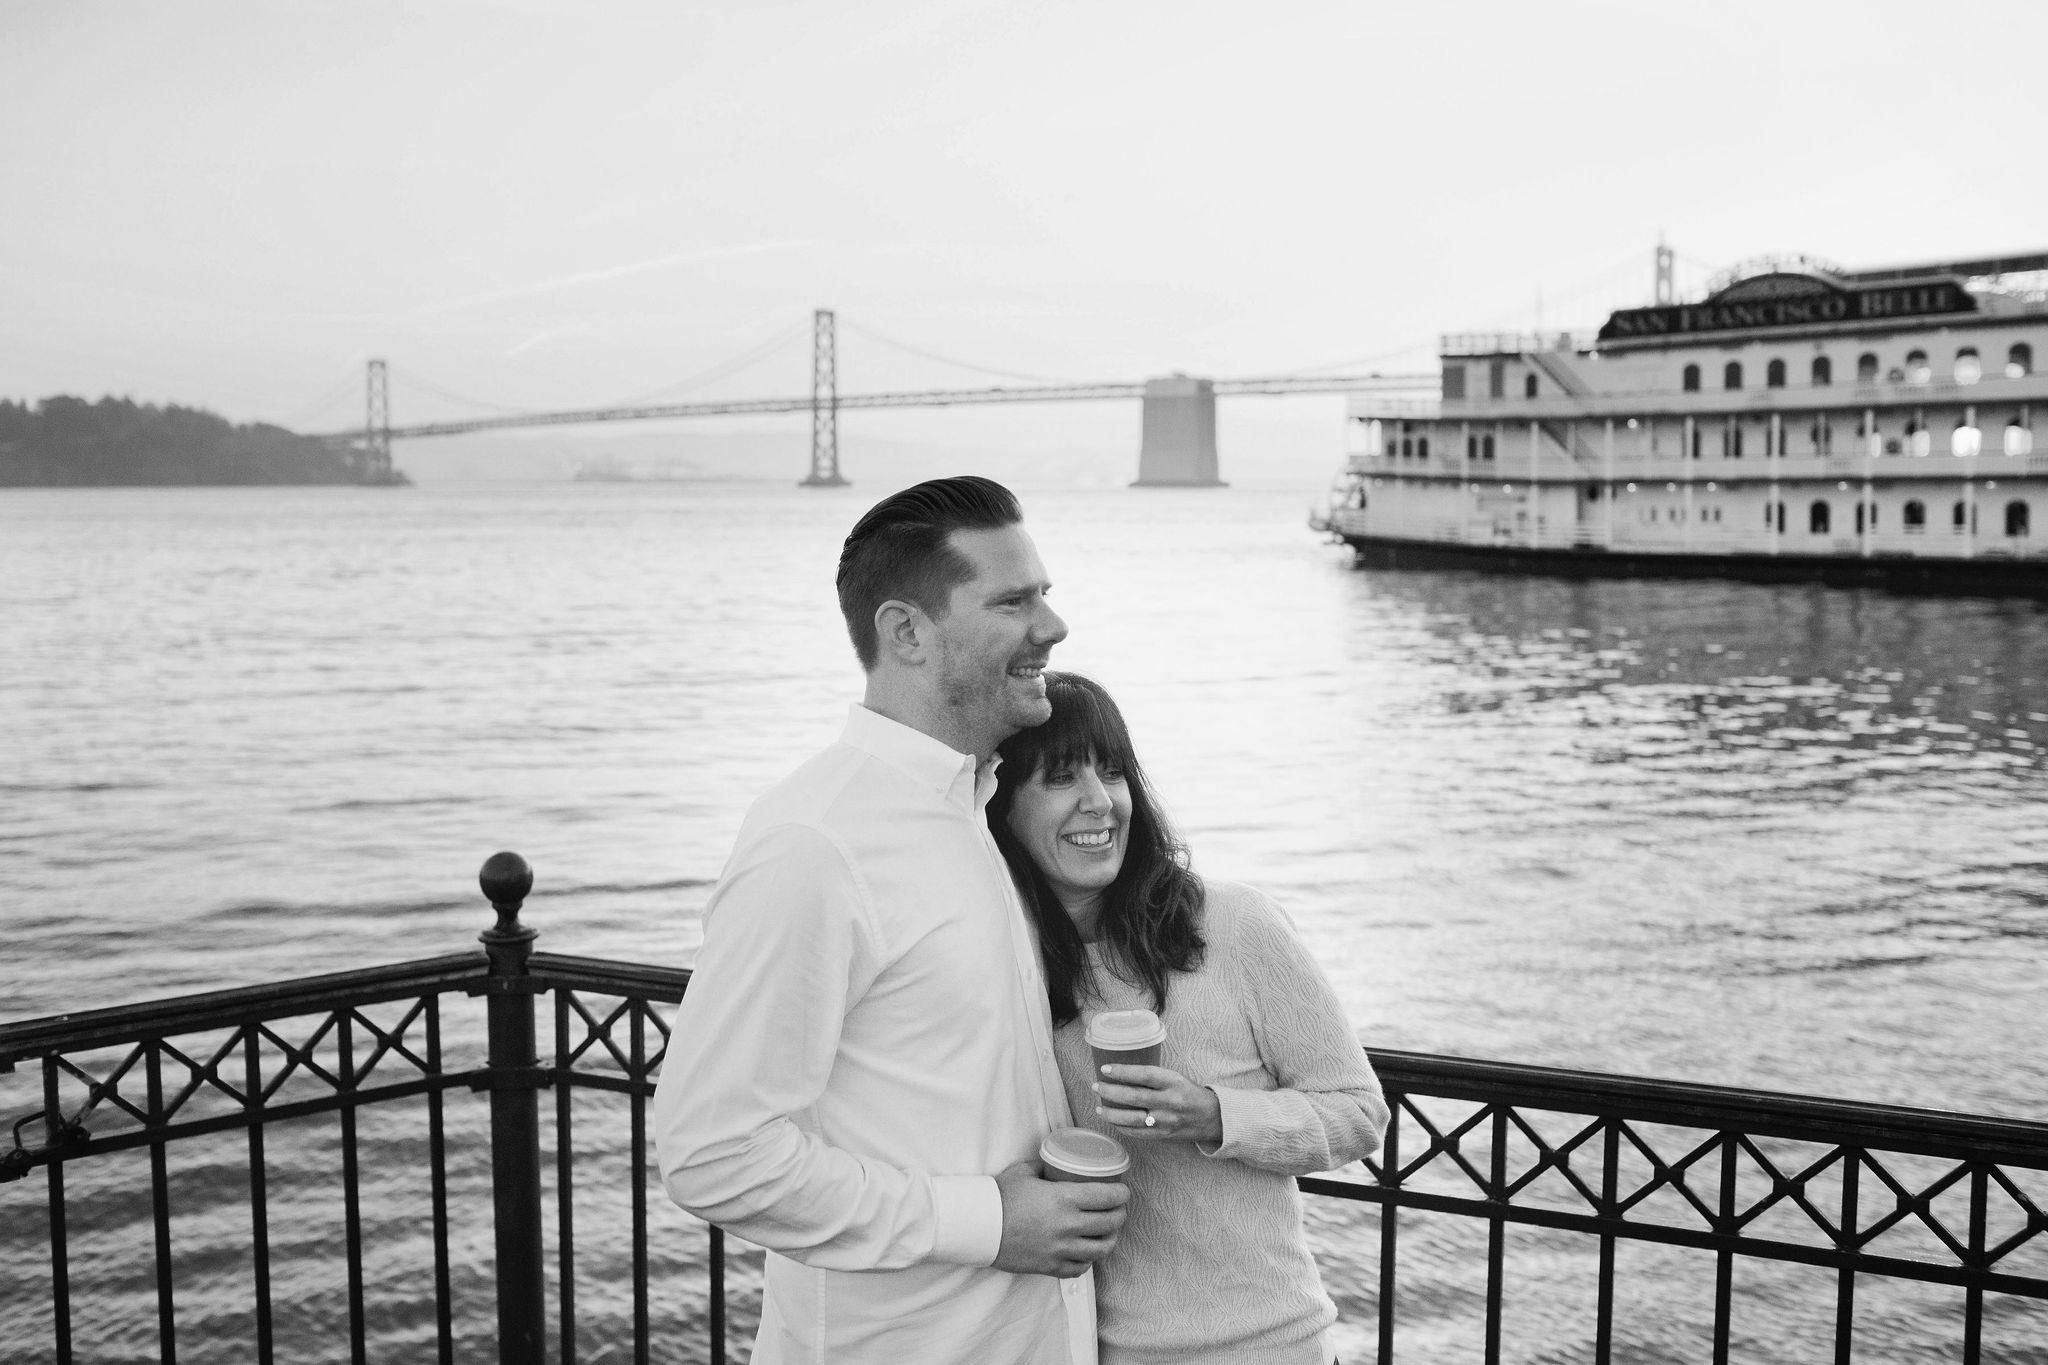 San-Francisco-Engagement-10.JPG